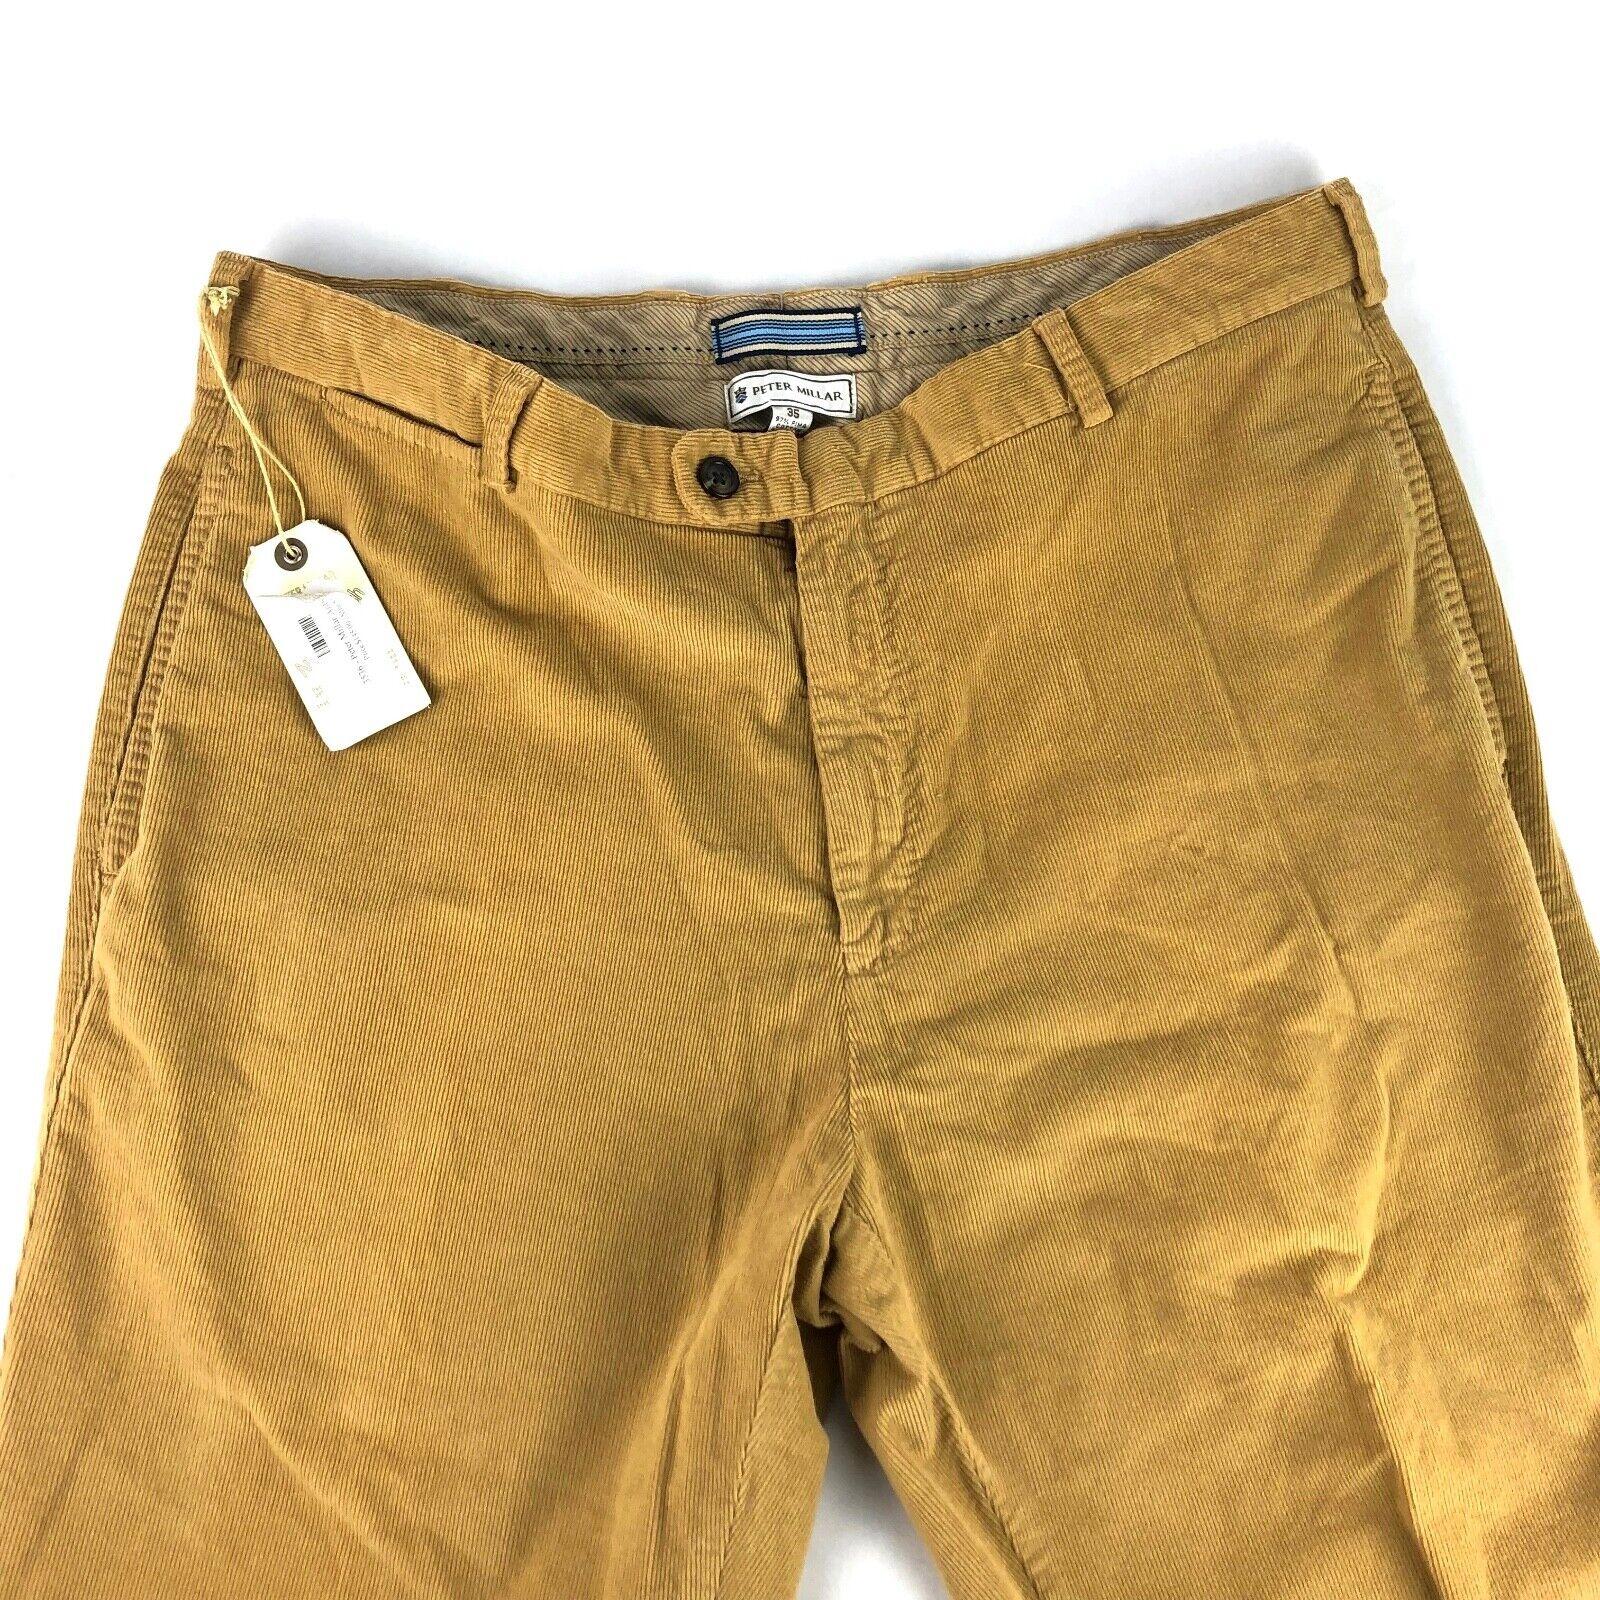 Peter Millar Twill Corduroy Tan Khaki Pants Antique Wash 35 36 NWT MSRP